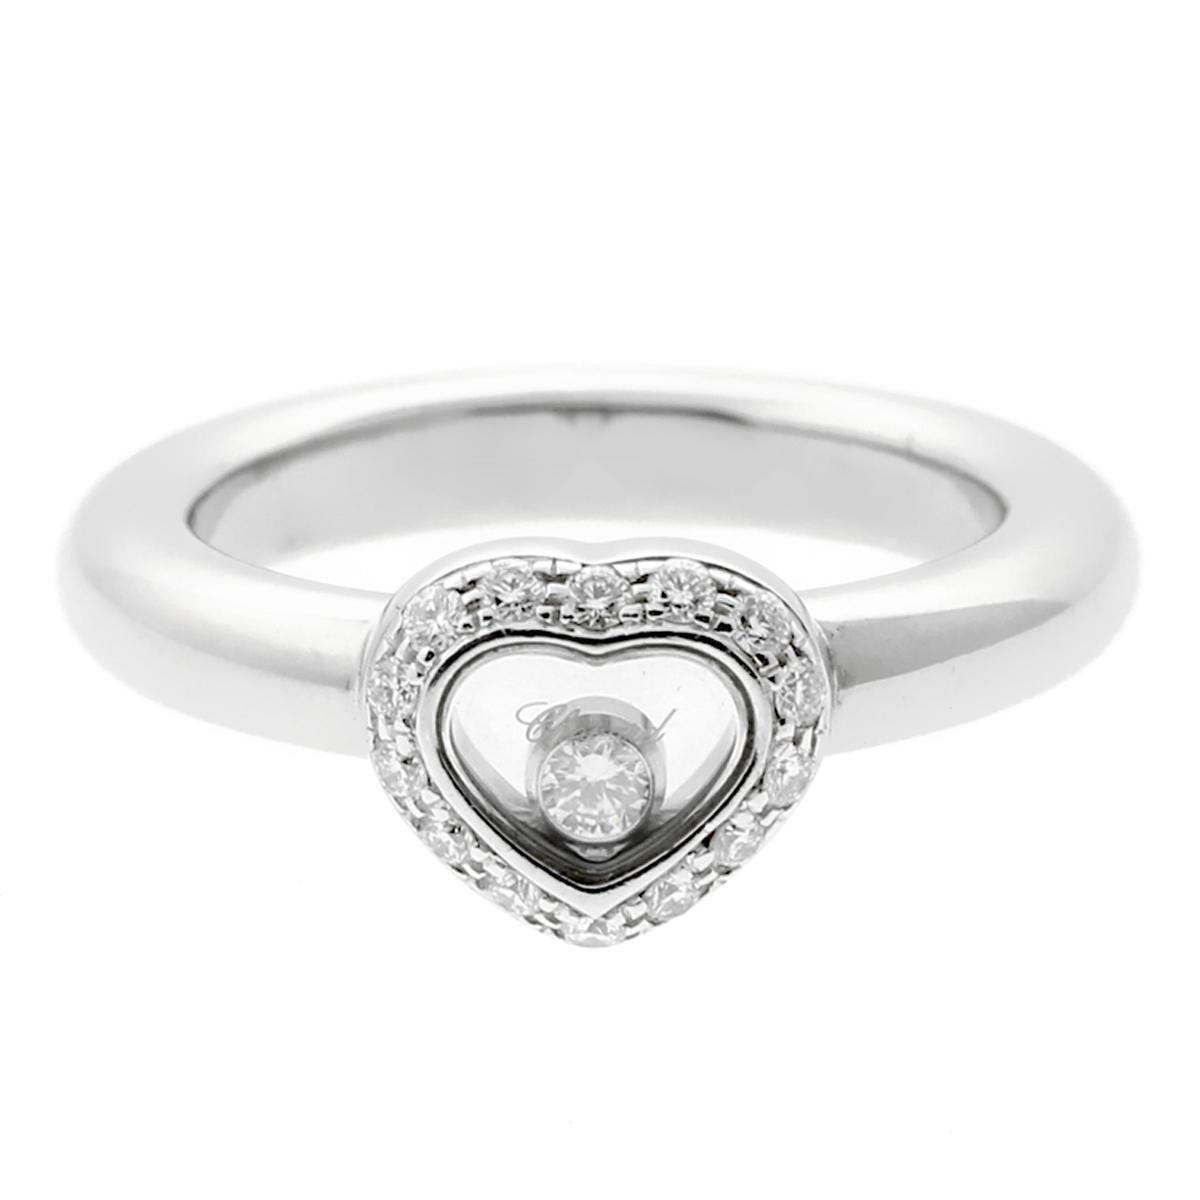 feef432216a Chopard Happy Diamond Rings - 55 For Sale on 1stdibs